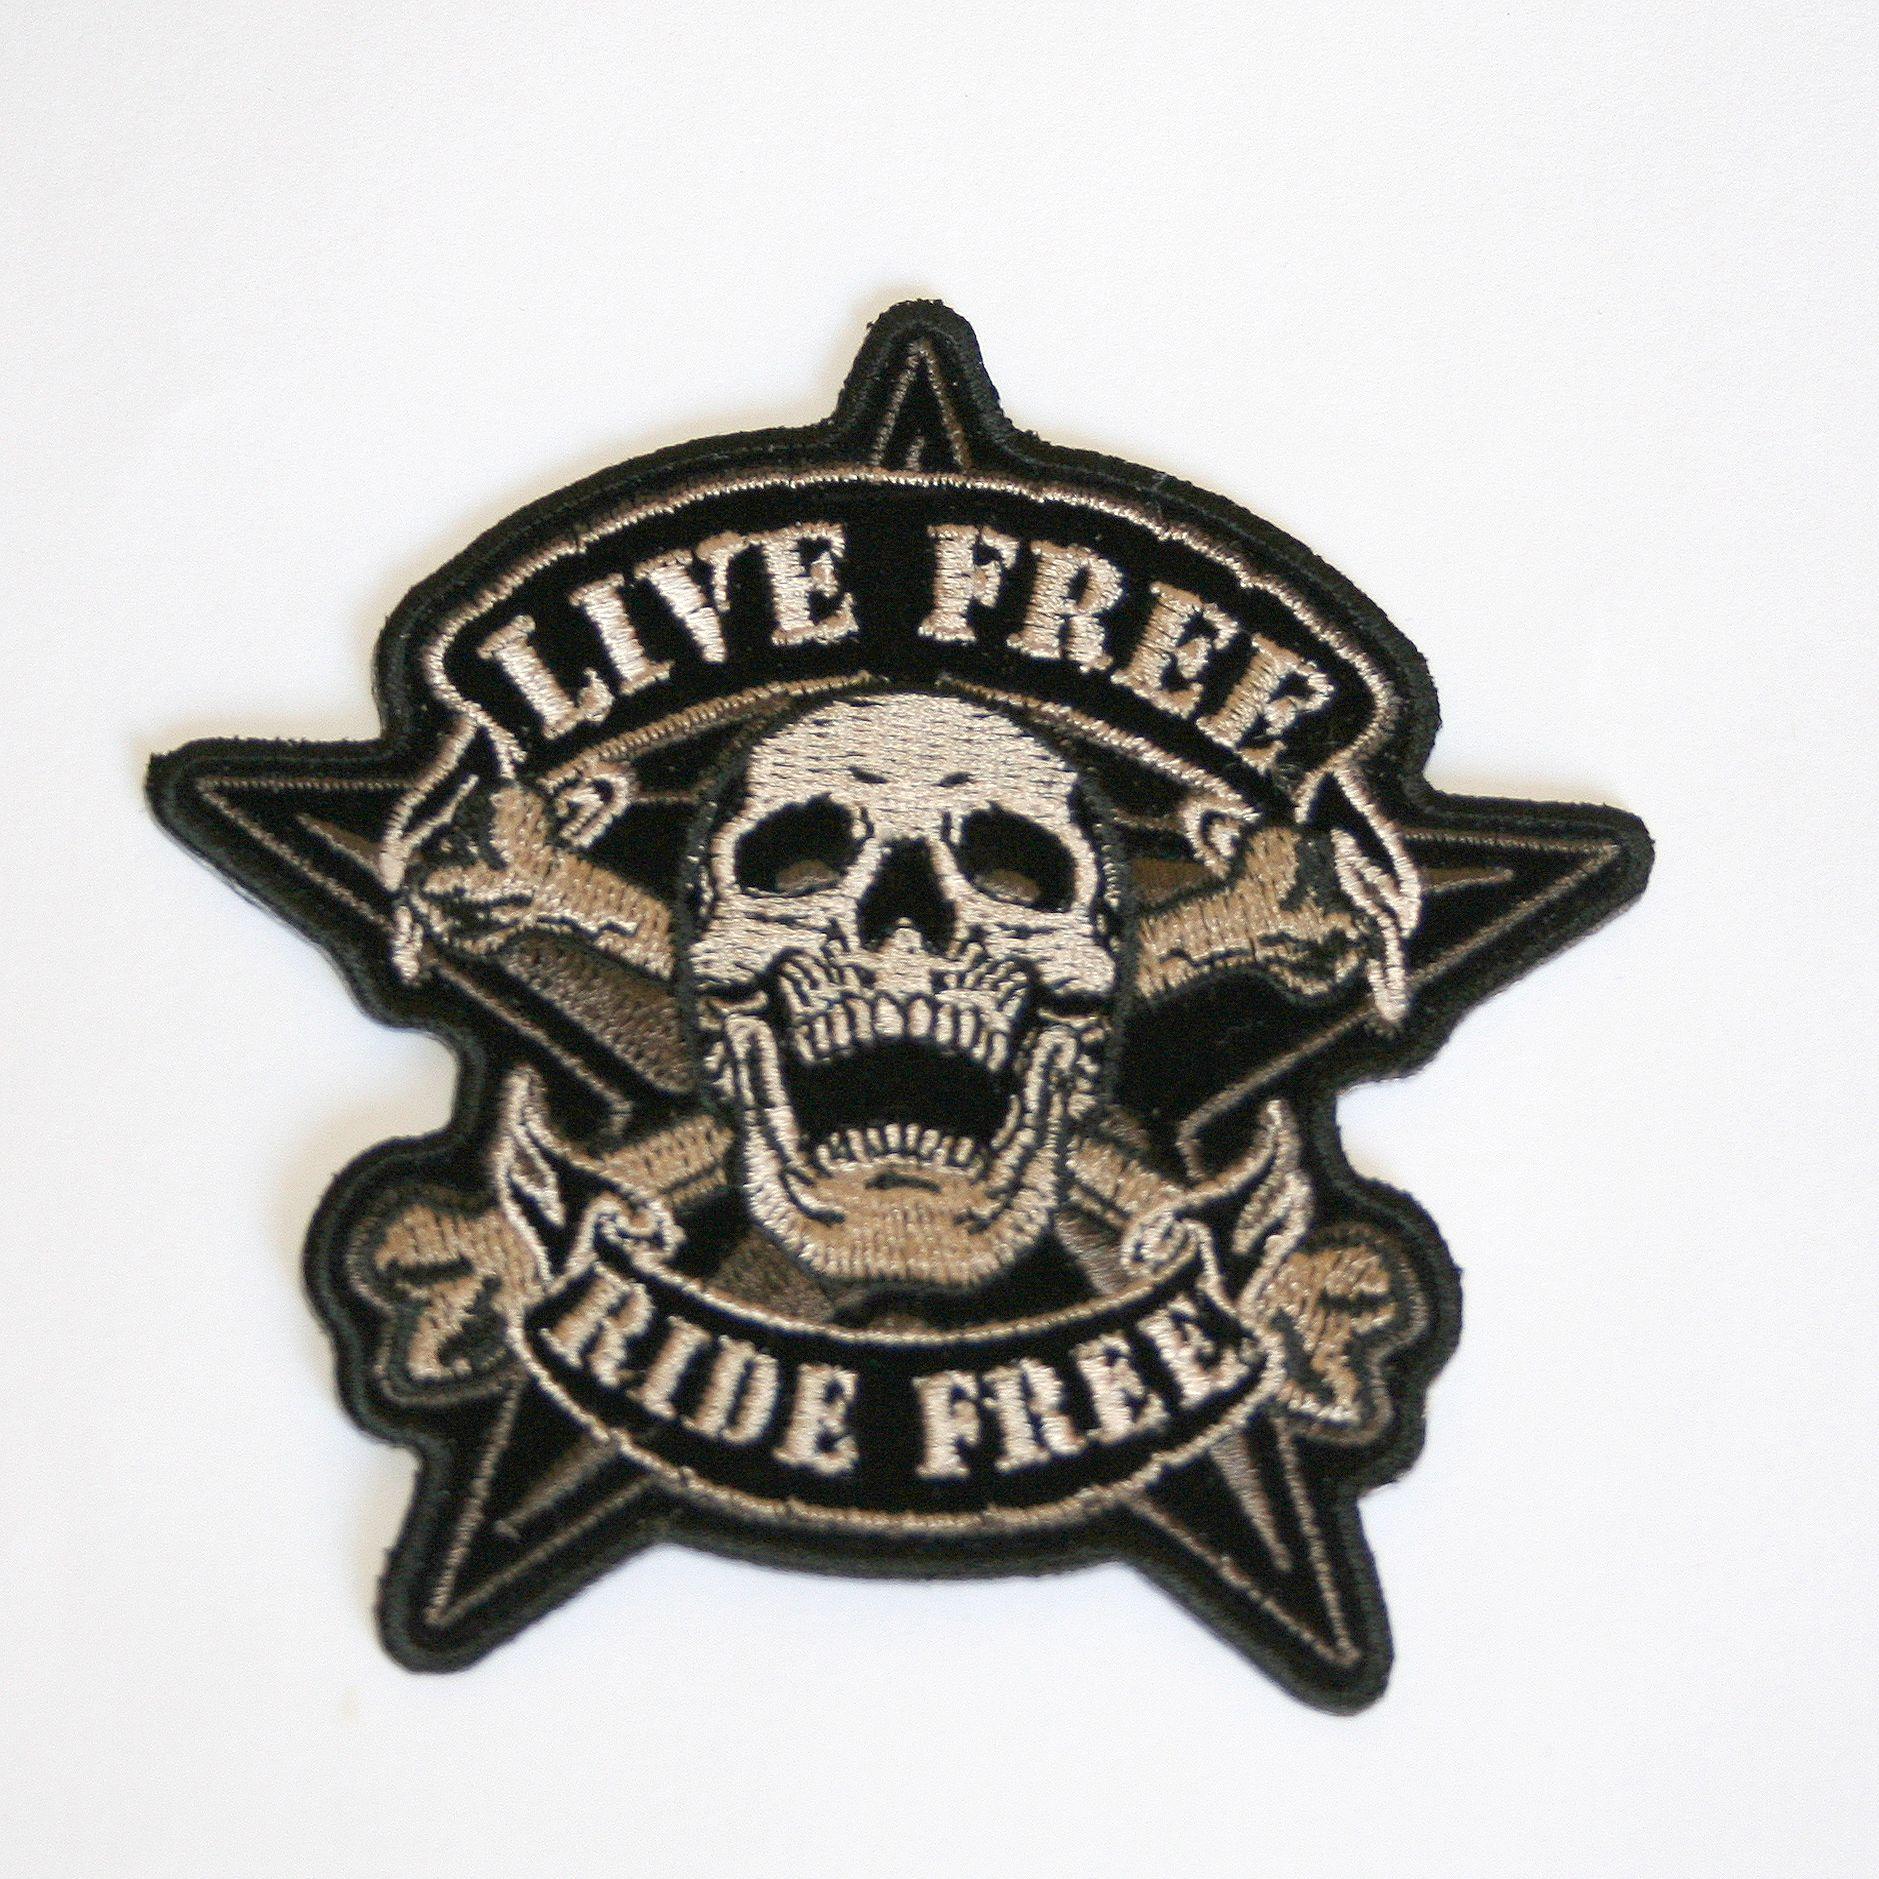 Parche motero, moto harley, productos americanos, calavera, USA, made in USA, parches bordados. Do it yourself. DIY. Customiza tus jeans. Biker patches, www.usamericanshop.com